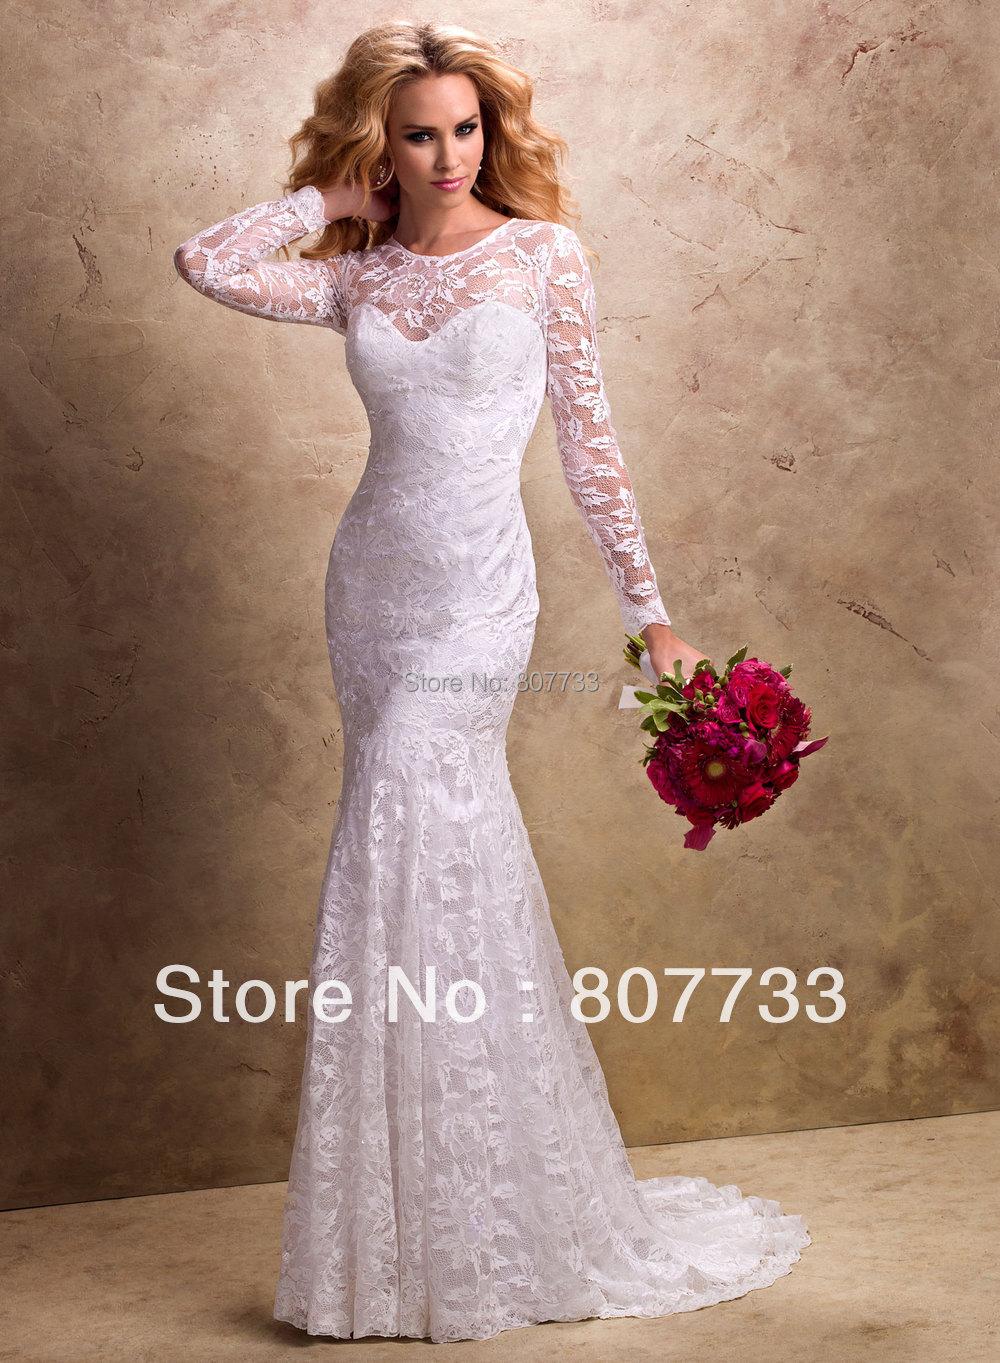 Beautiful mermaid wedding gowns 2014 elaboration top wedding gowns tt85 long sleeve sexy mermaid wedding dress 2014 in wedding dresses junglespirit Gallery